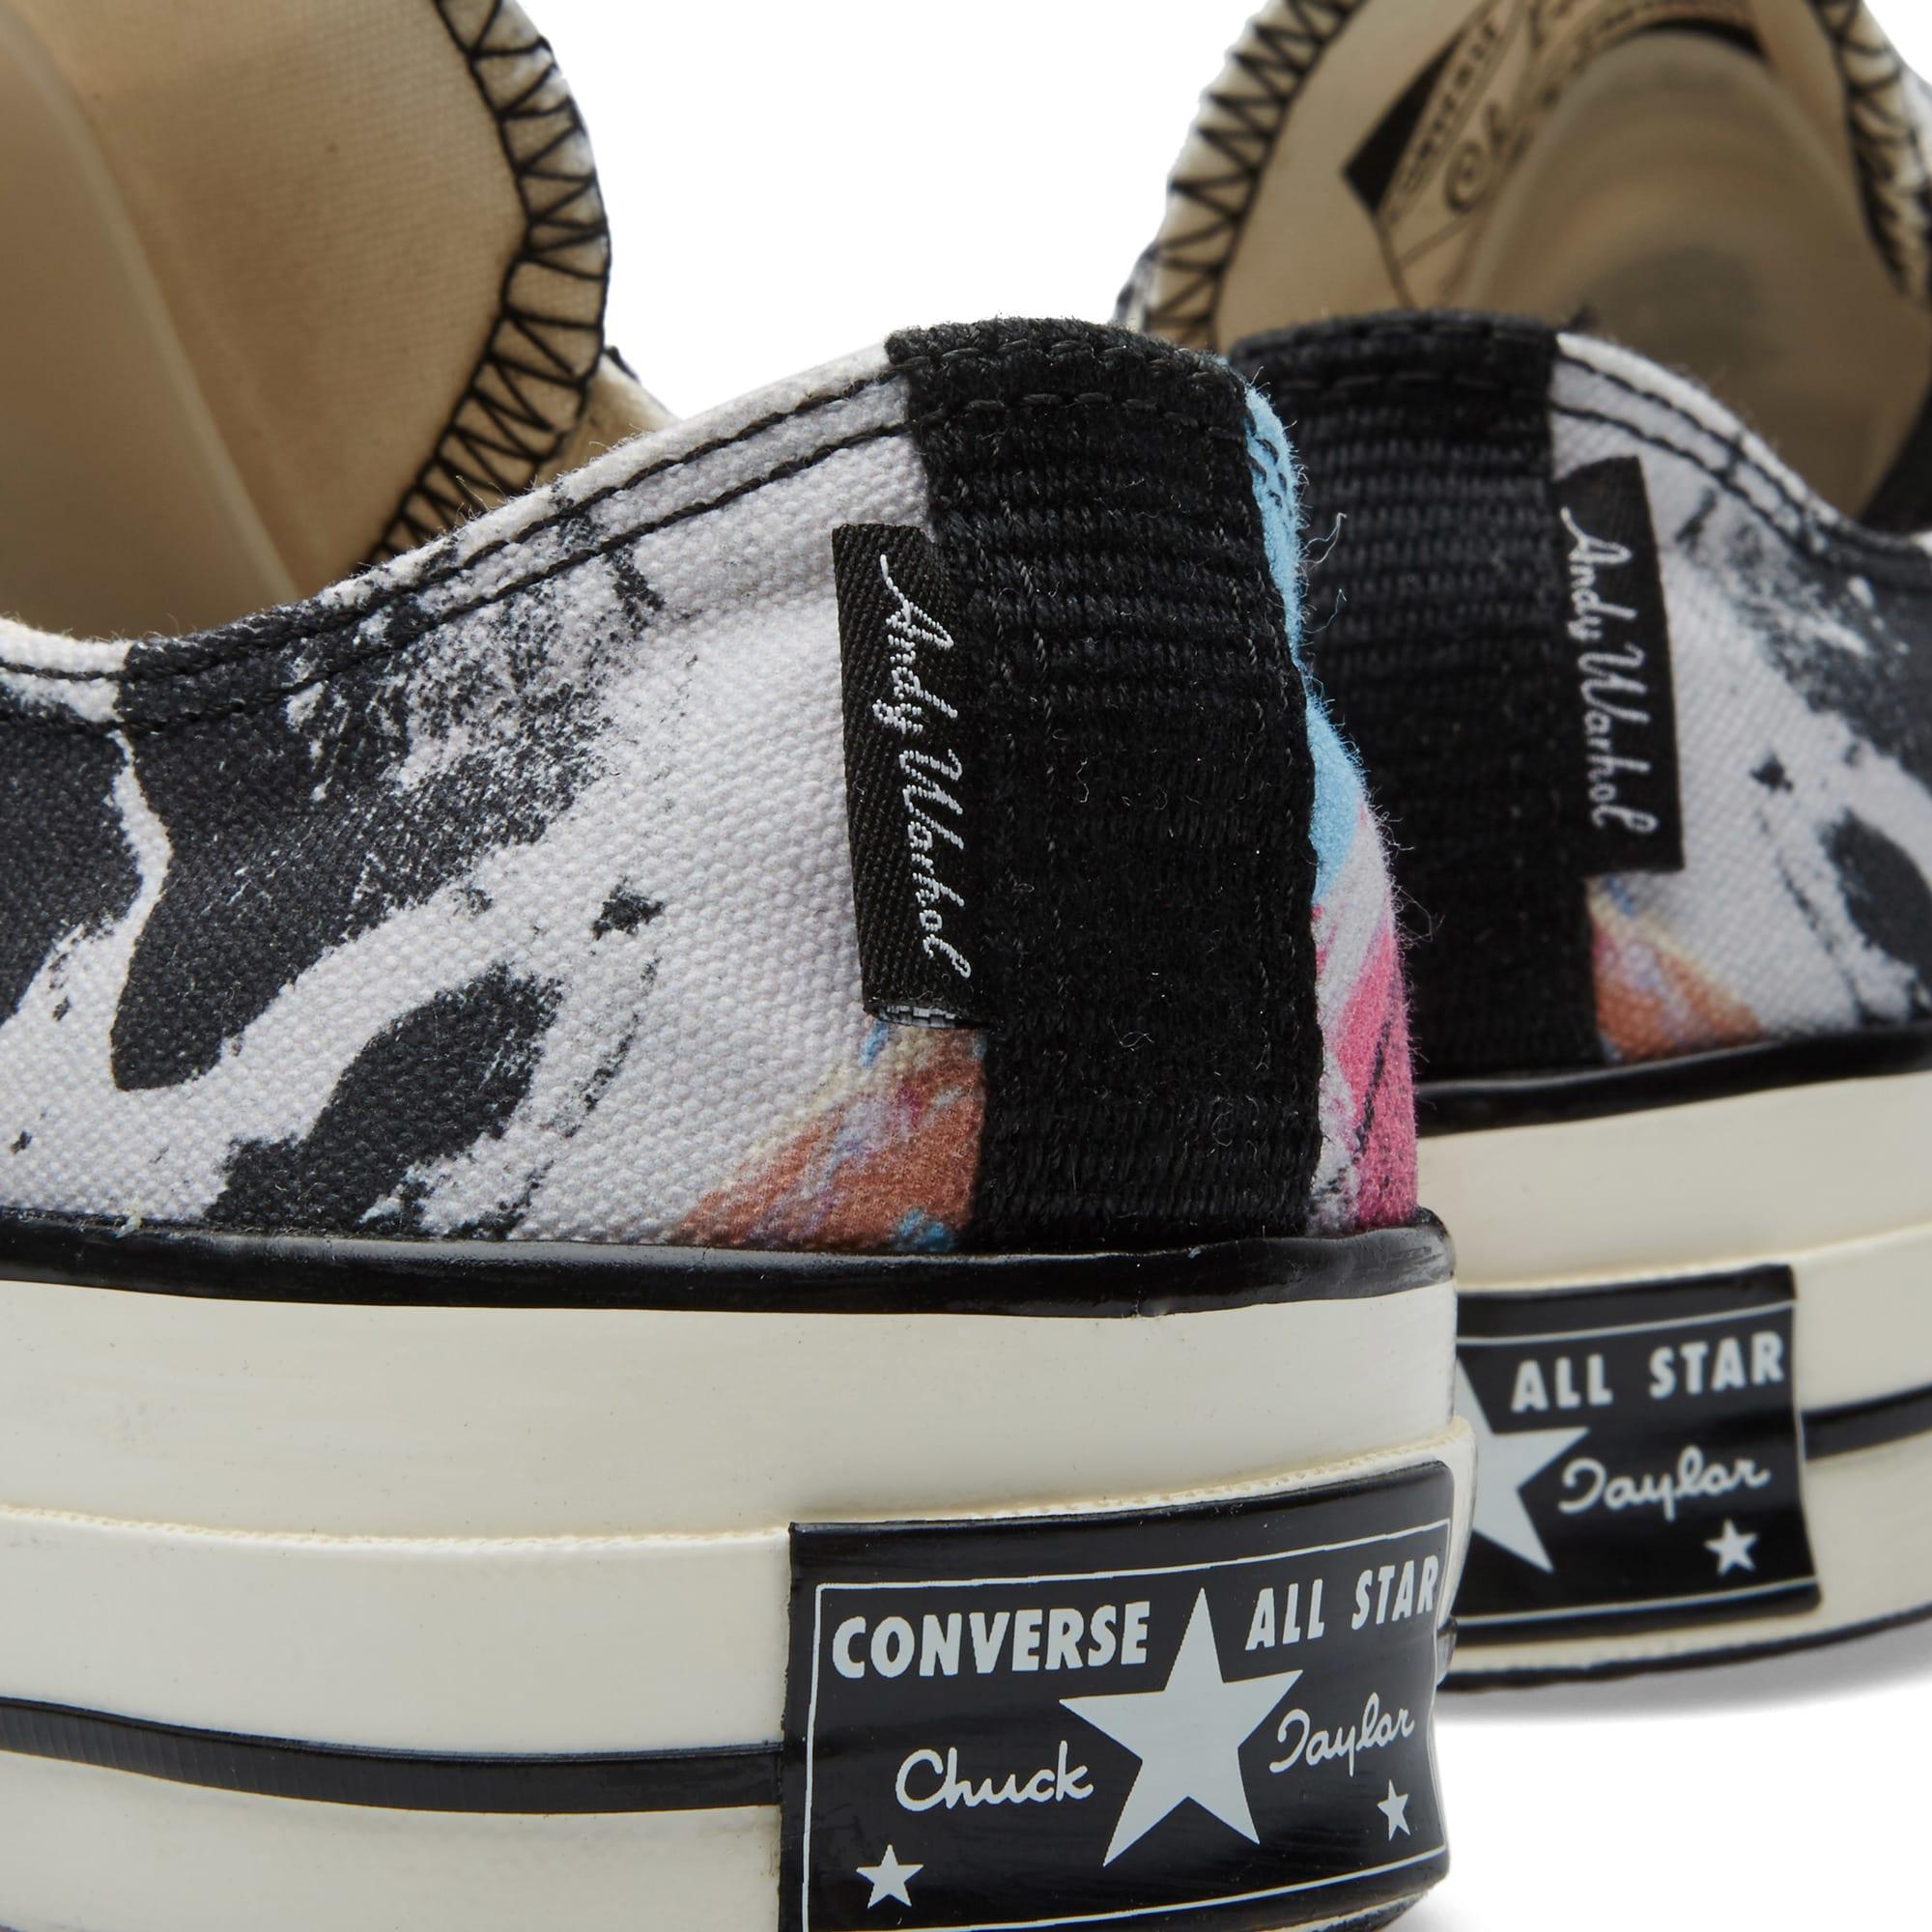 Andy Warhol Chuck Taylor 1970s Ox Pink